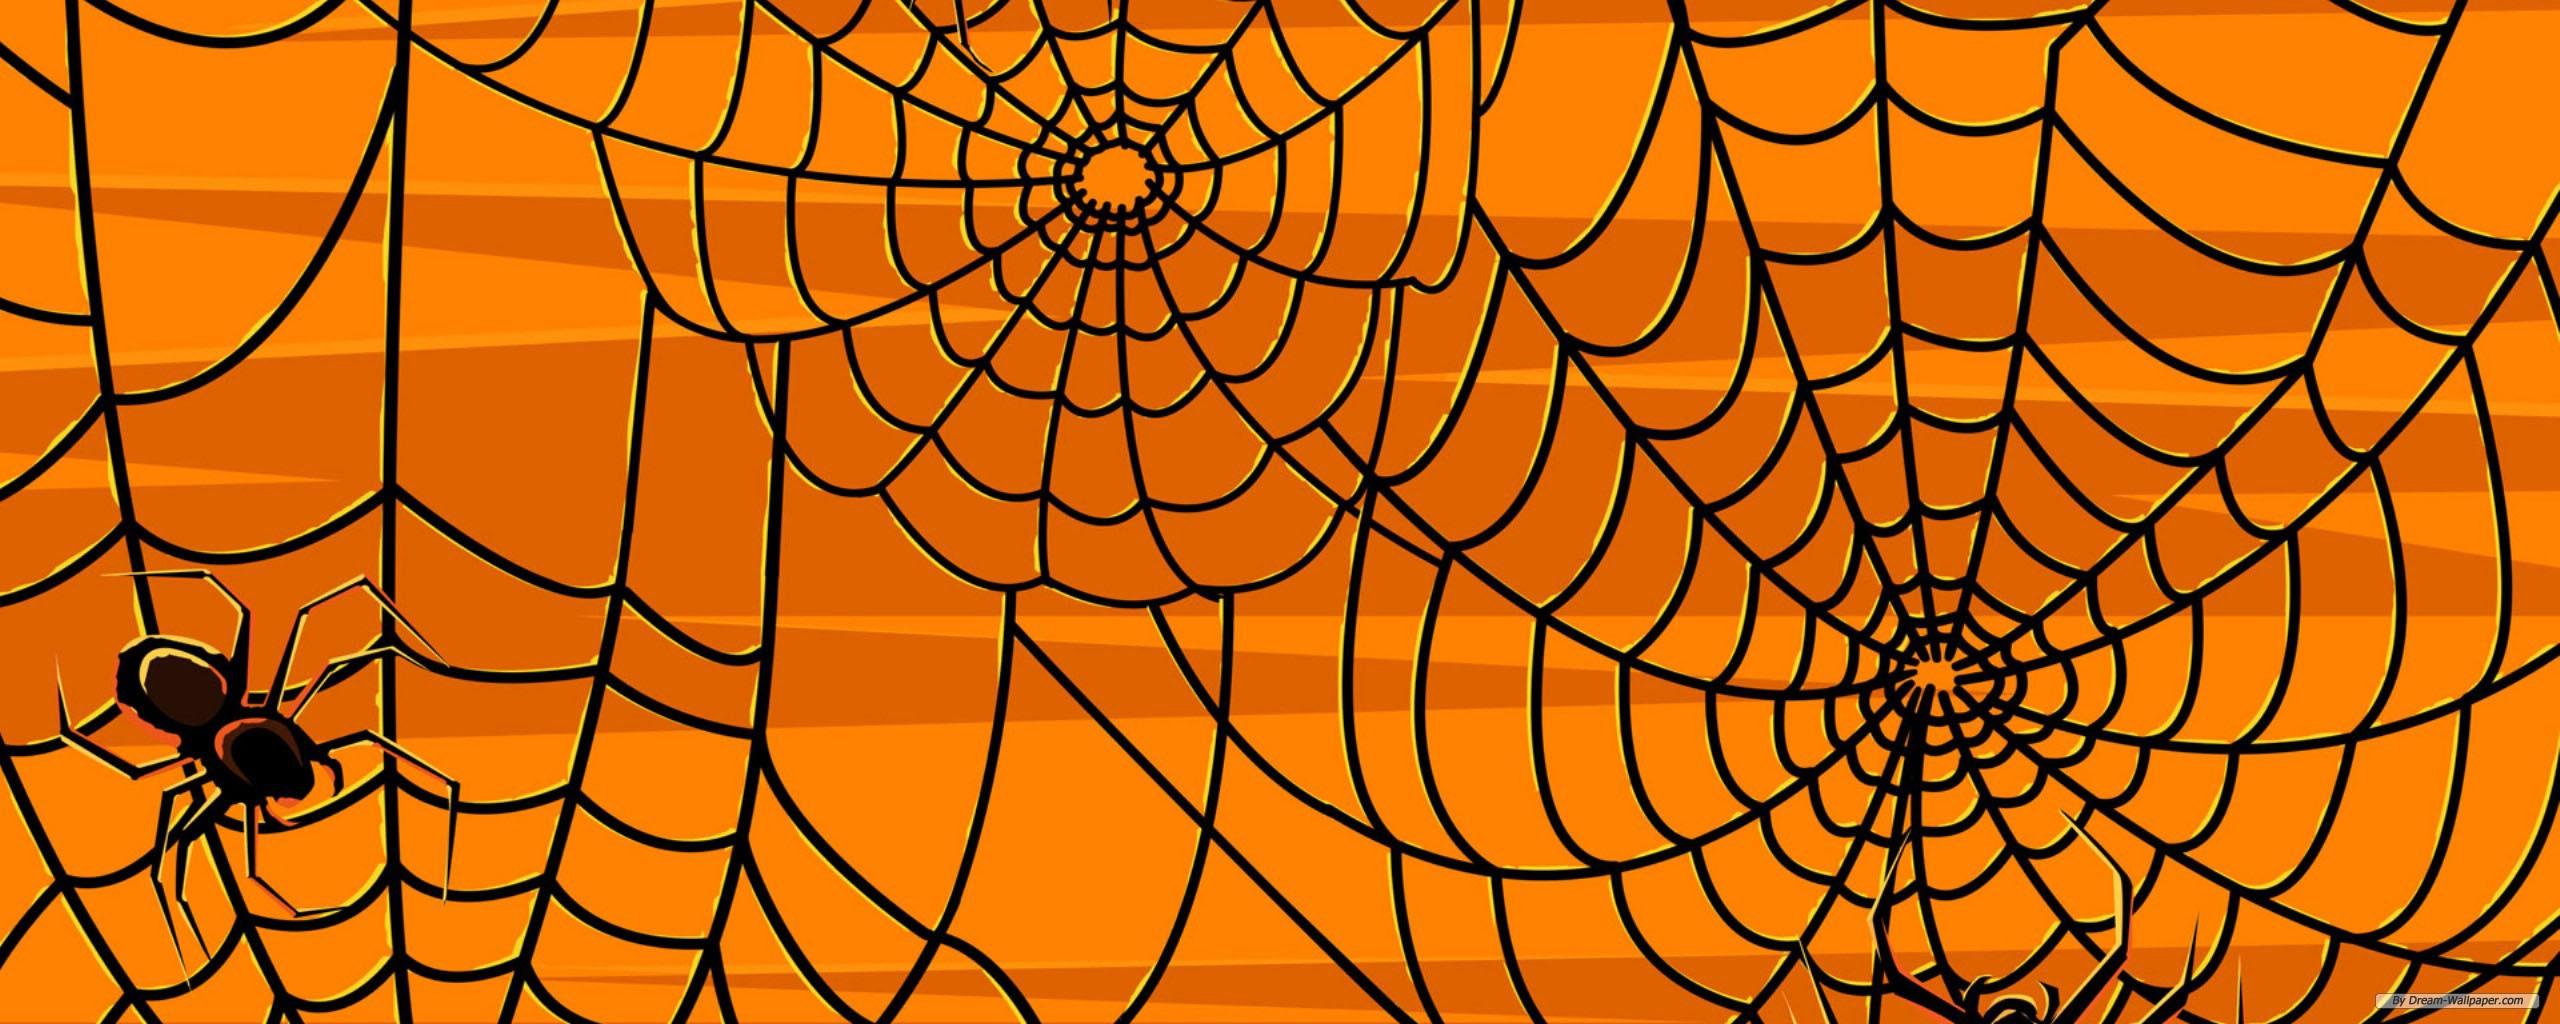 Holiday wallpaper   Halloween Episode 5 wallpaper   dual screen 2560x1024